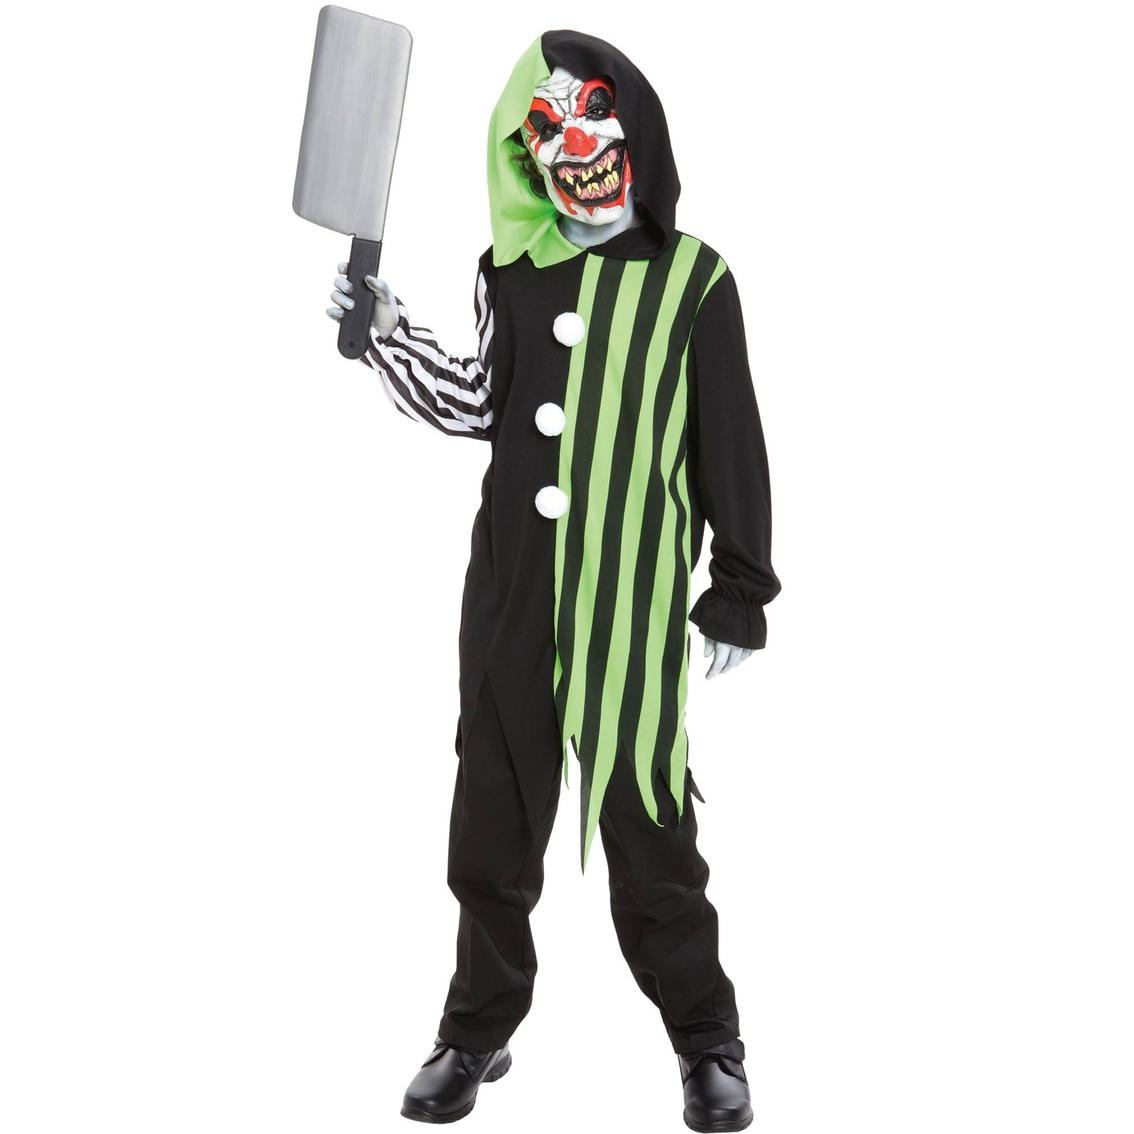 Cleaver The Clown Child Costume Hooded Robe /& Mask Halloween Seasonal Visions